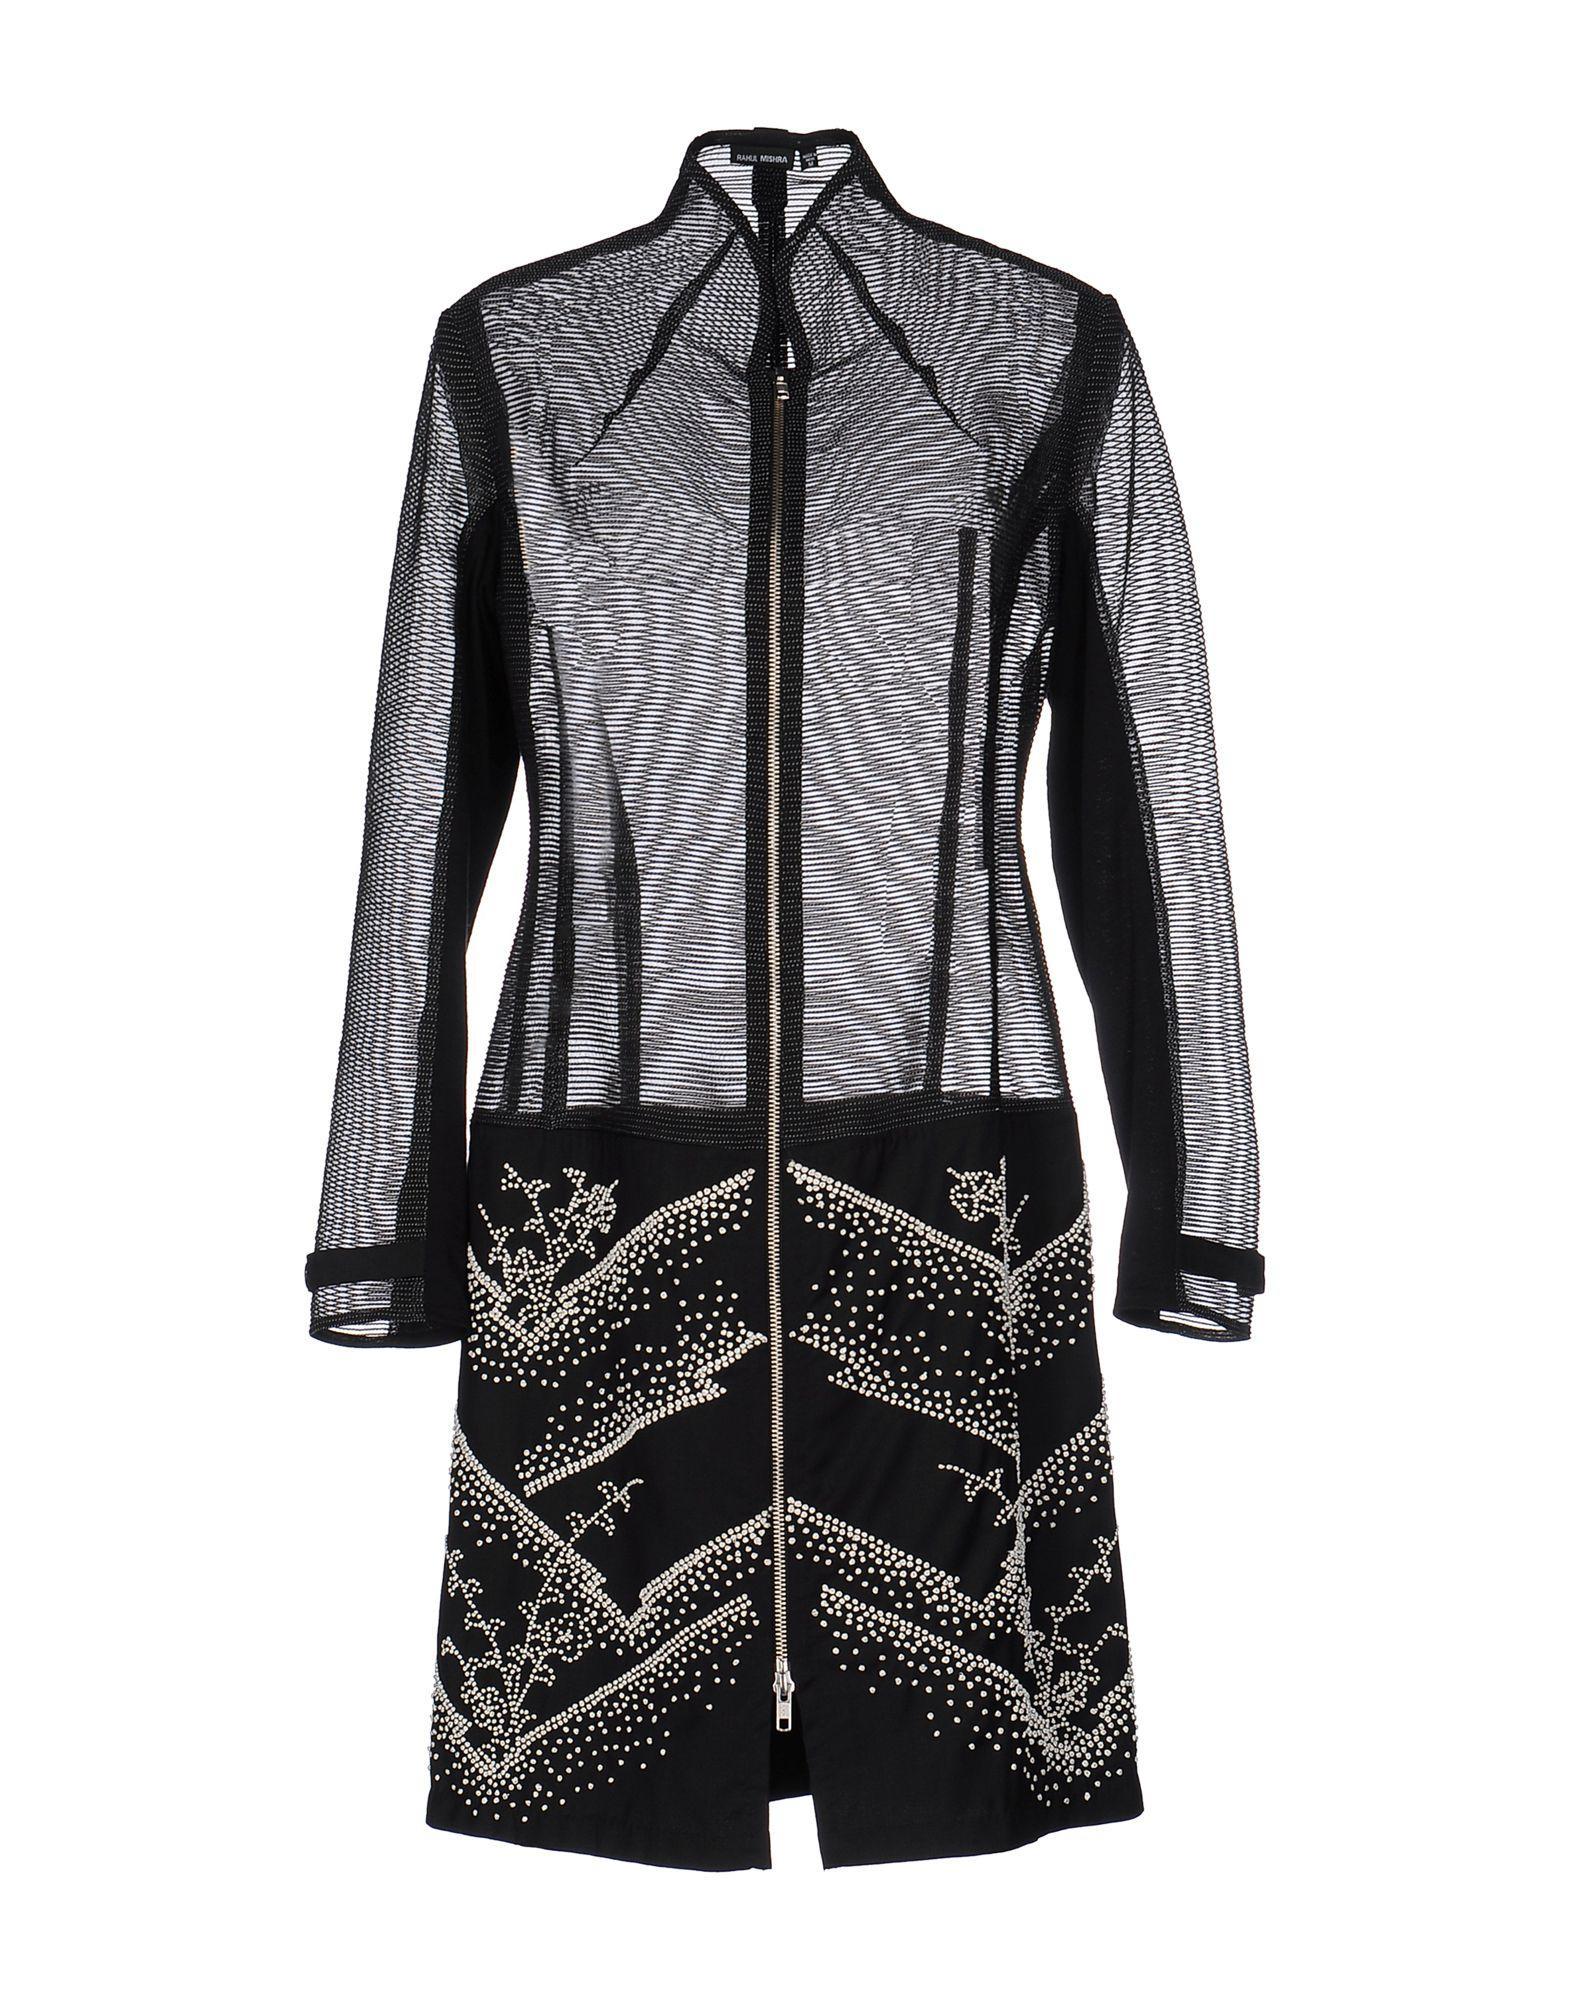 Rahul Mishra Full-length Jacket In Black